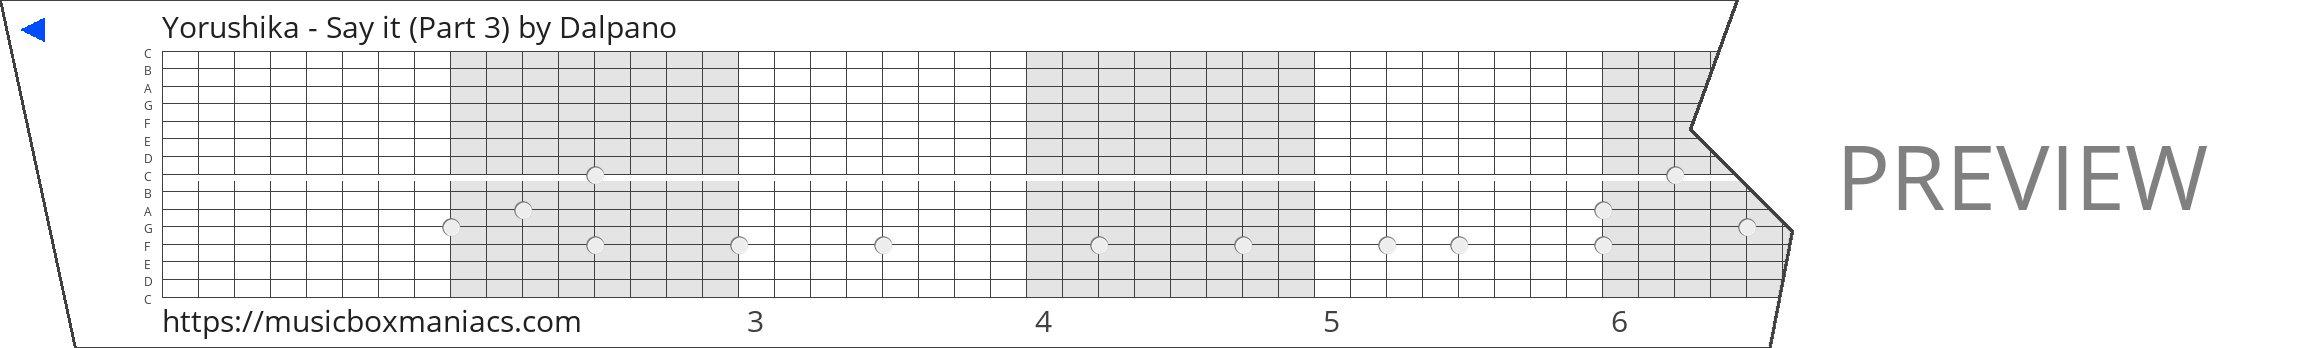 Yorushika - Say it (Part 3) 15 note music box paper strip